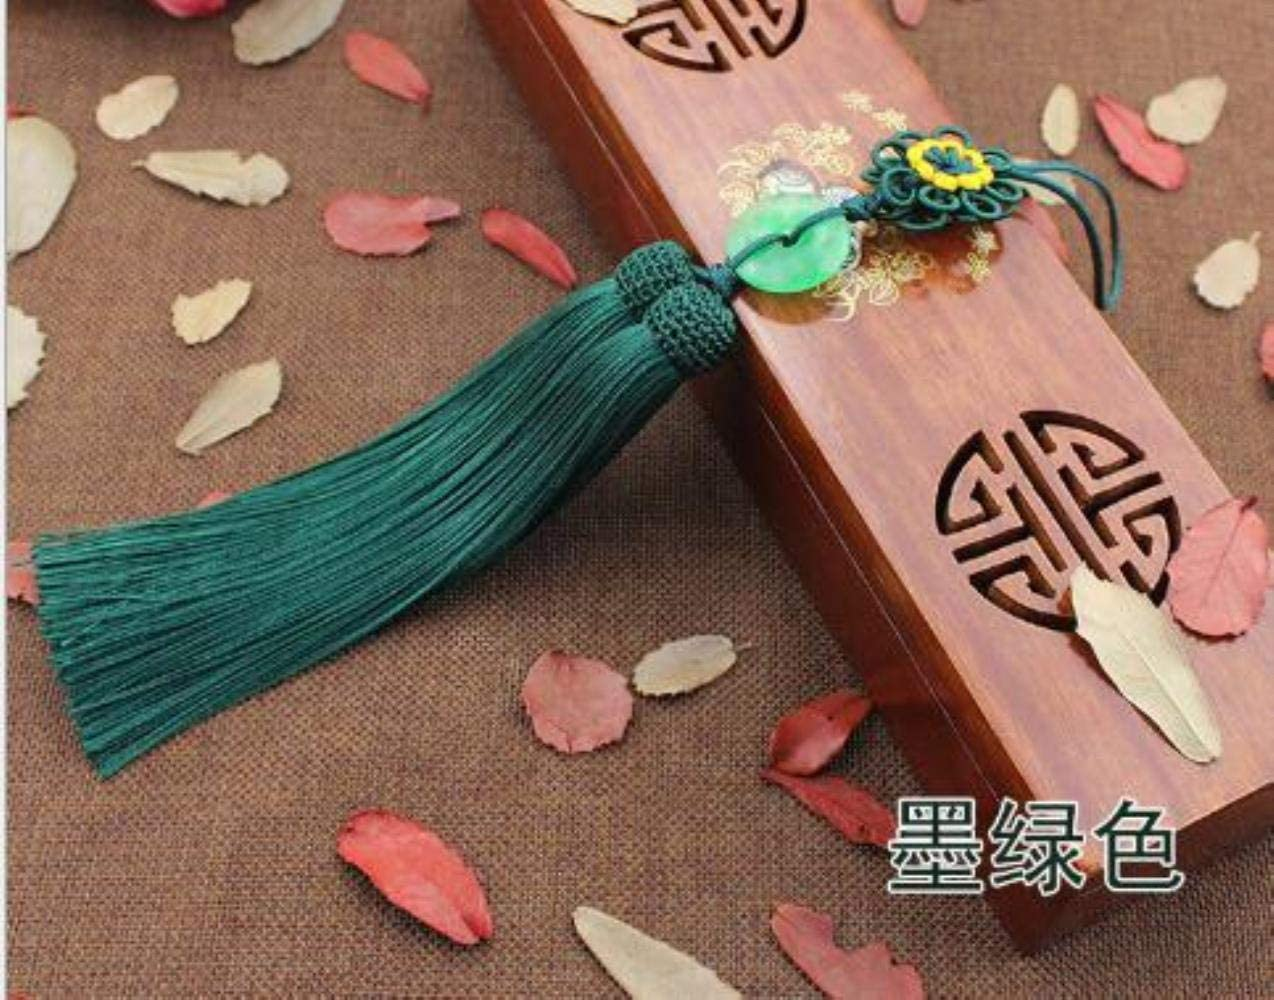 Mingi 1 pcs borlas 33 cm de Largo Colgante de Jade Nudo Chino Borla ColganteJade Borla Significa Paz, Verde Oscuro, 33 cm